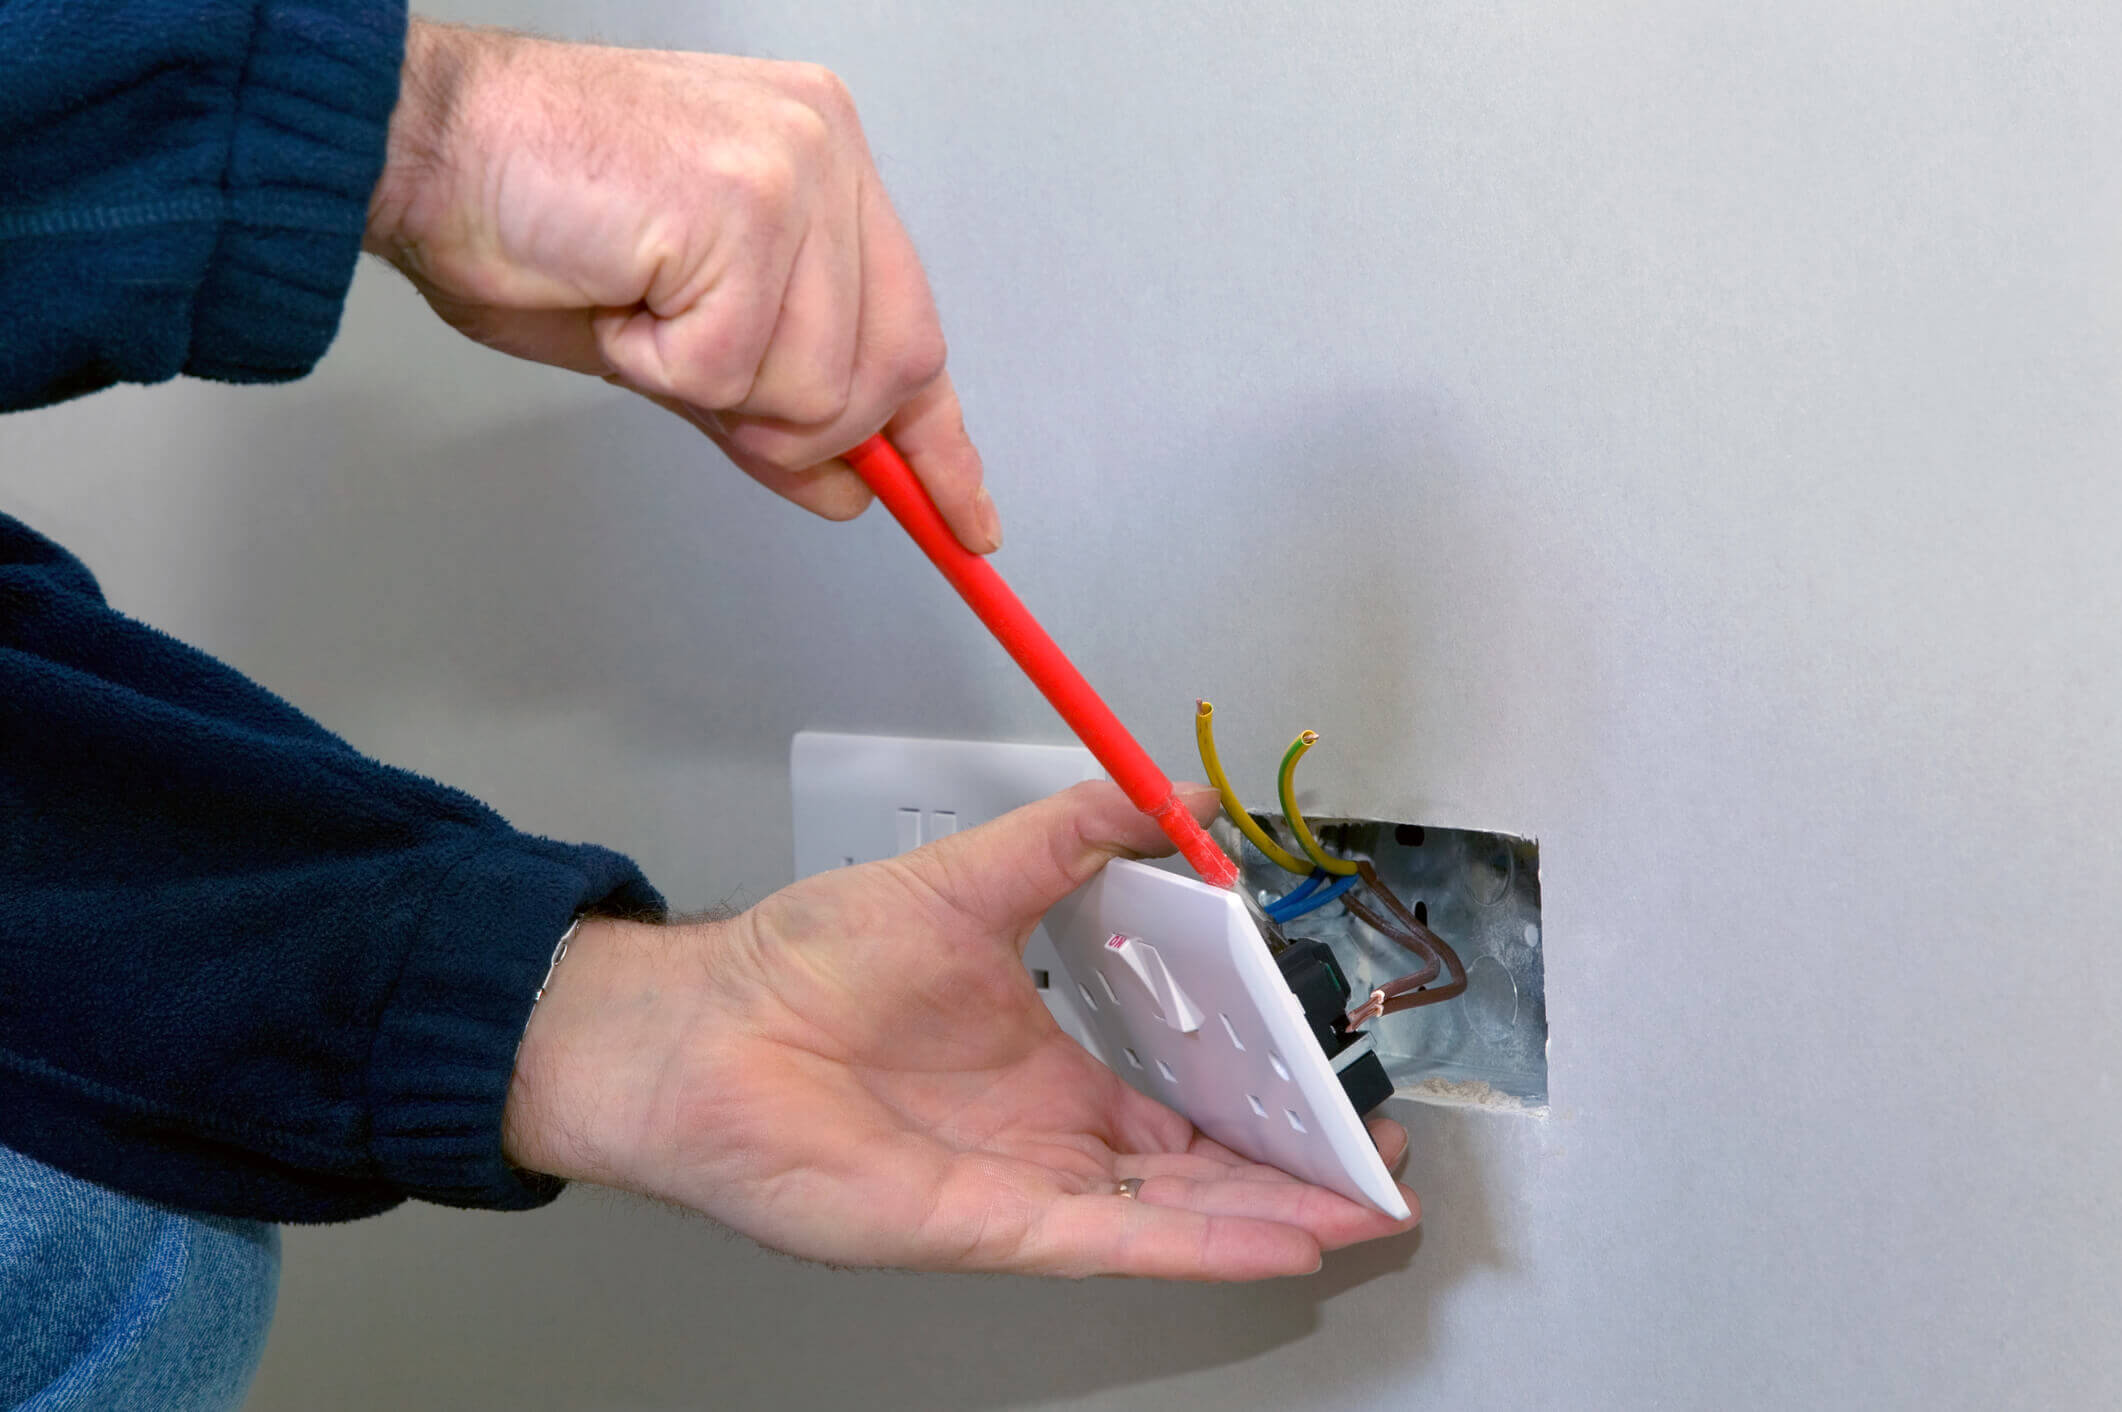 Electrician installing a socket.